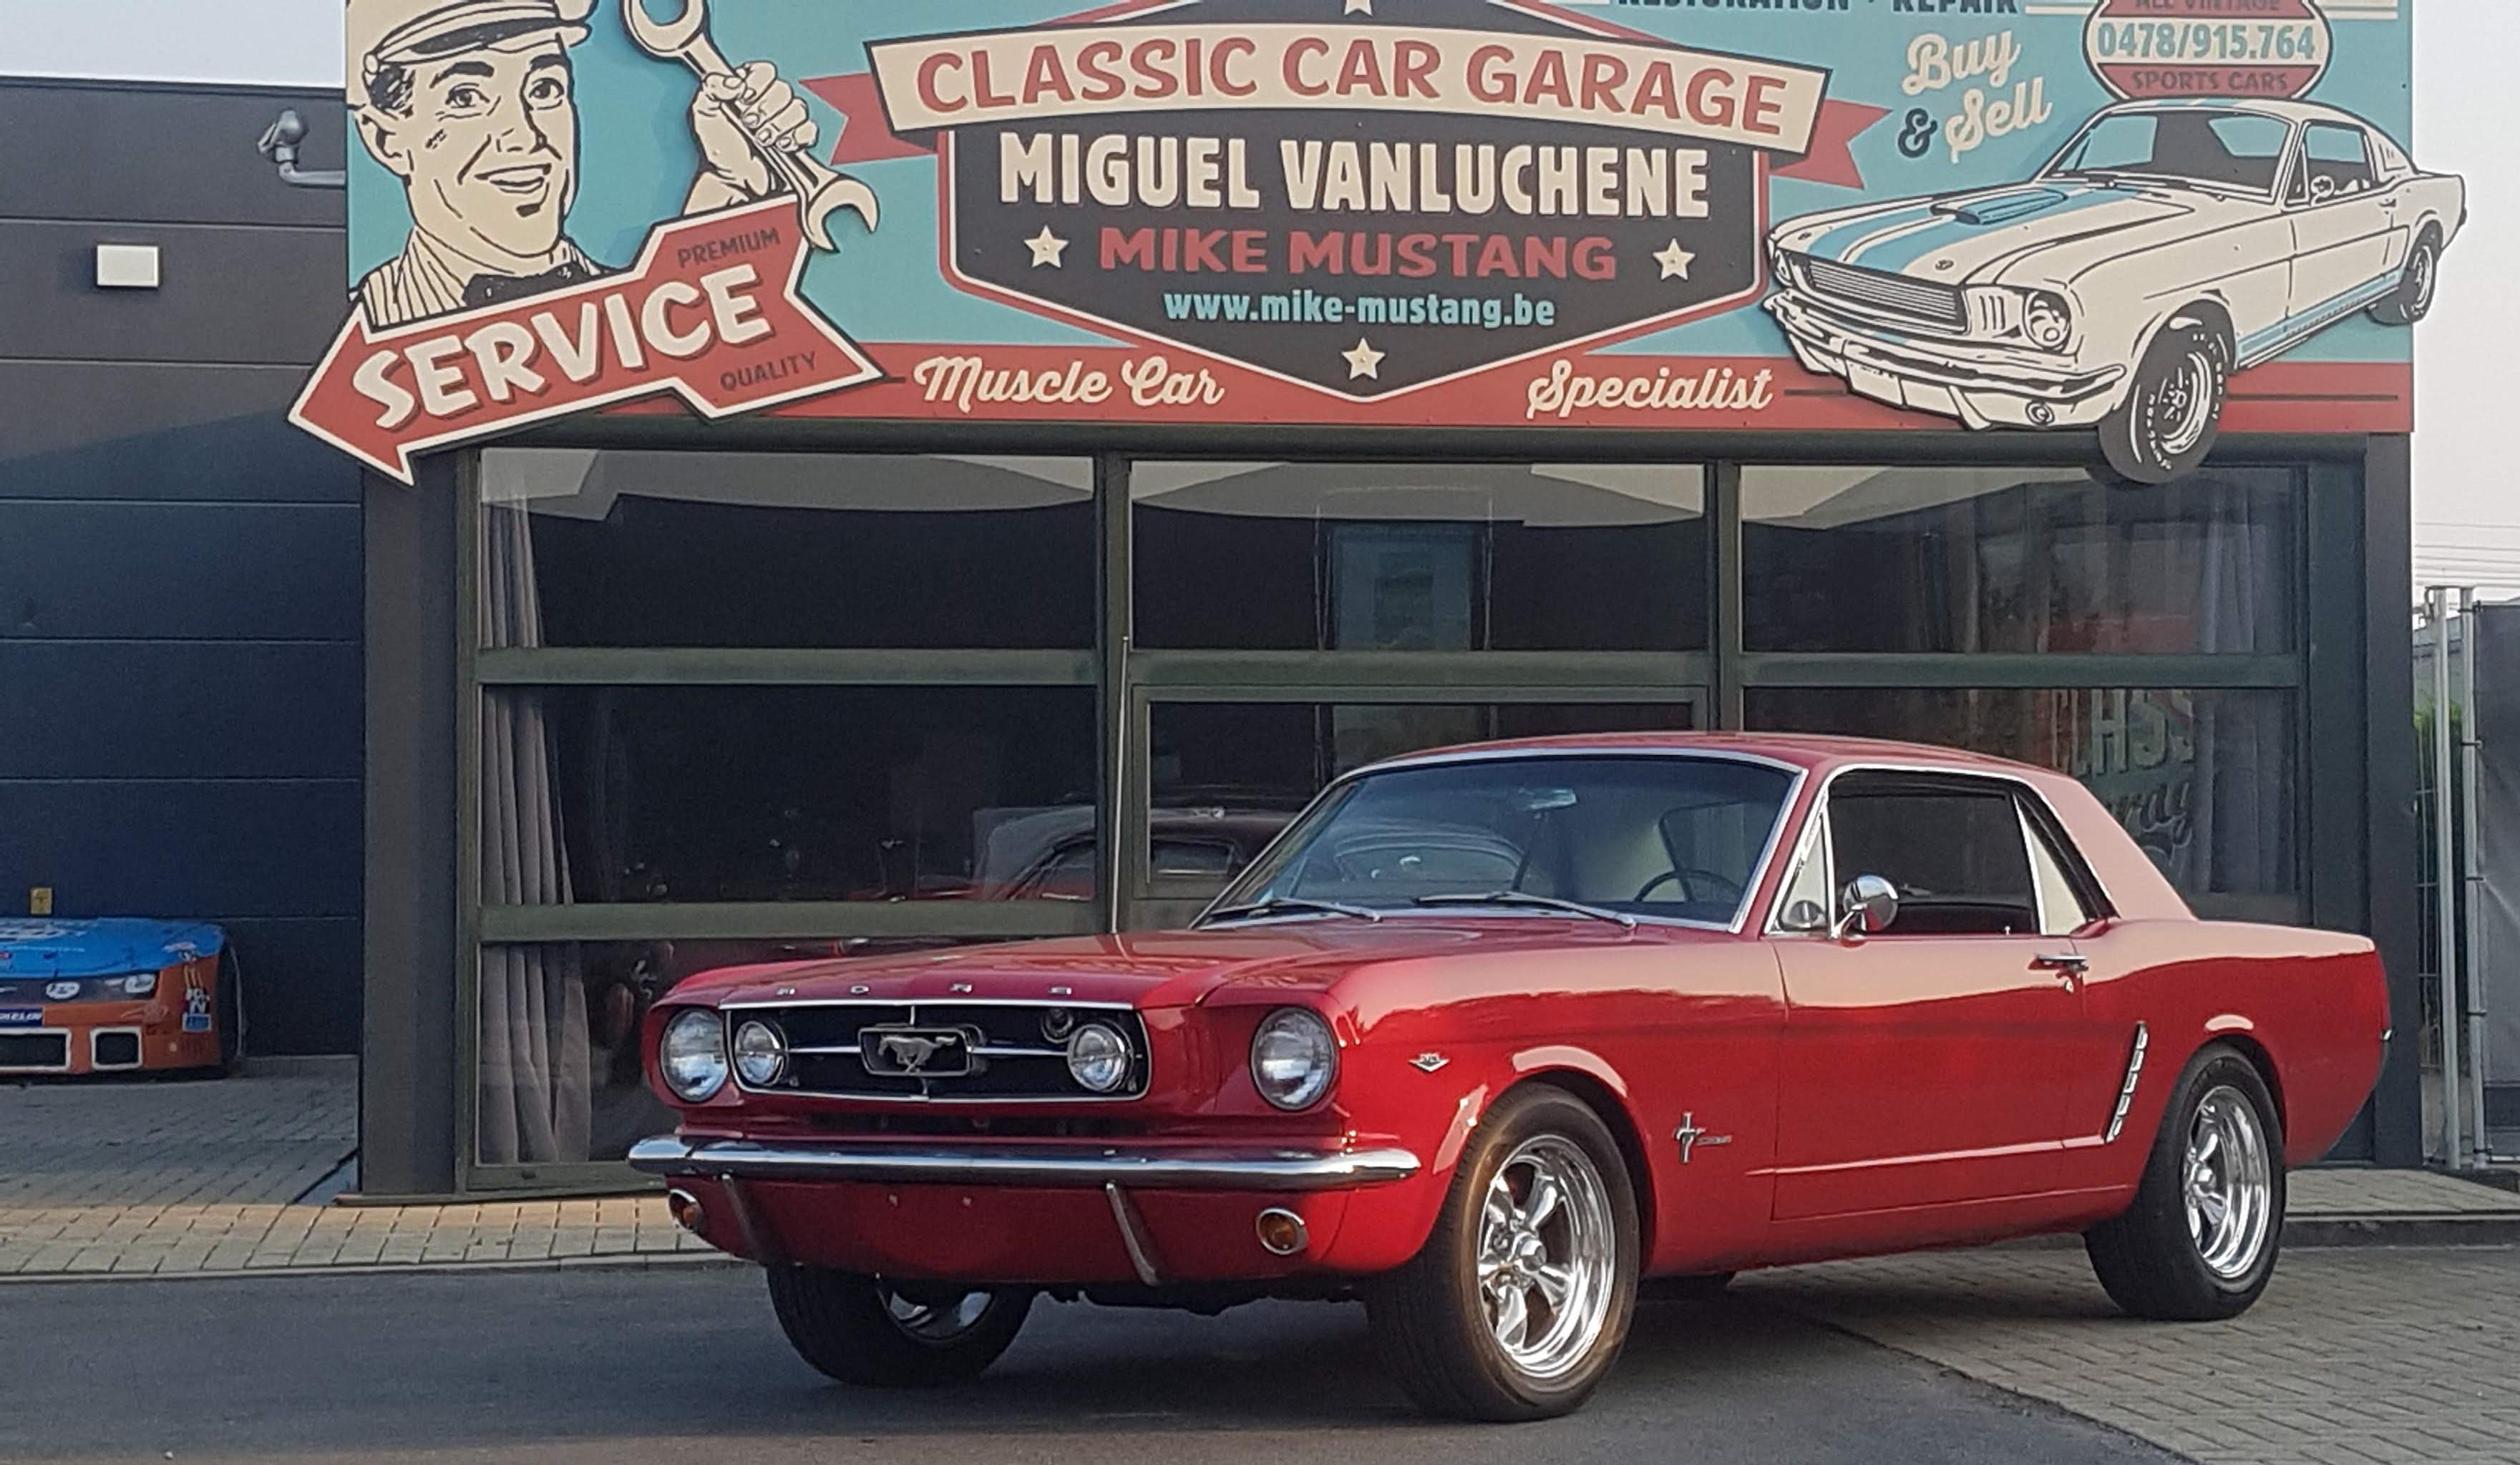 Mike Mustang